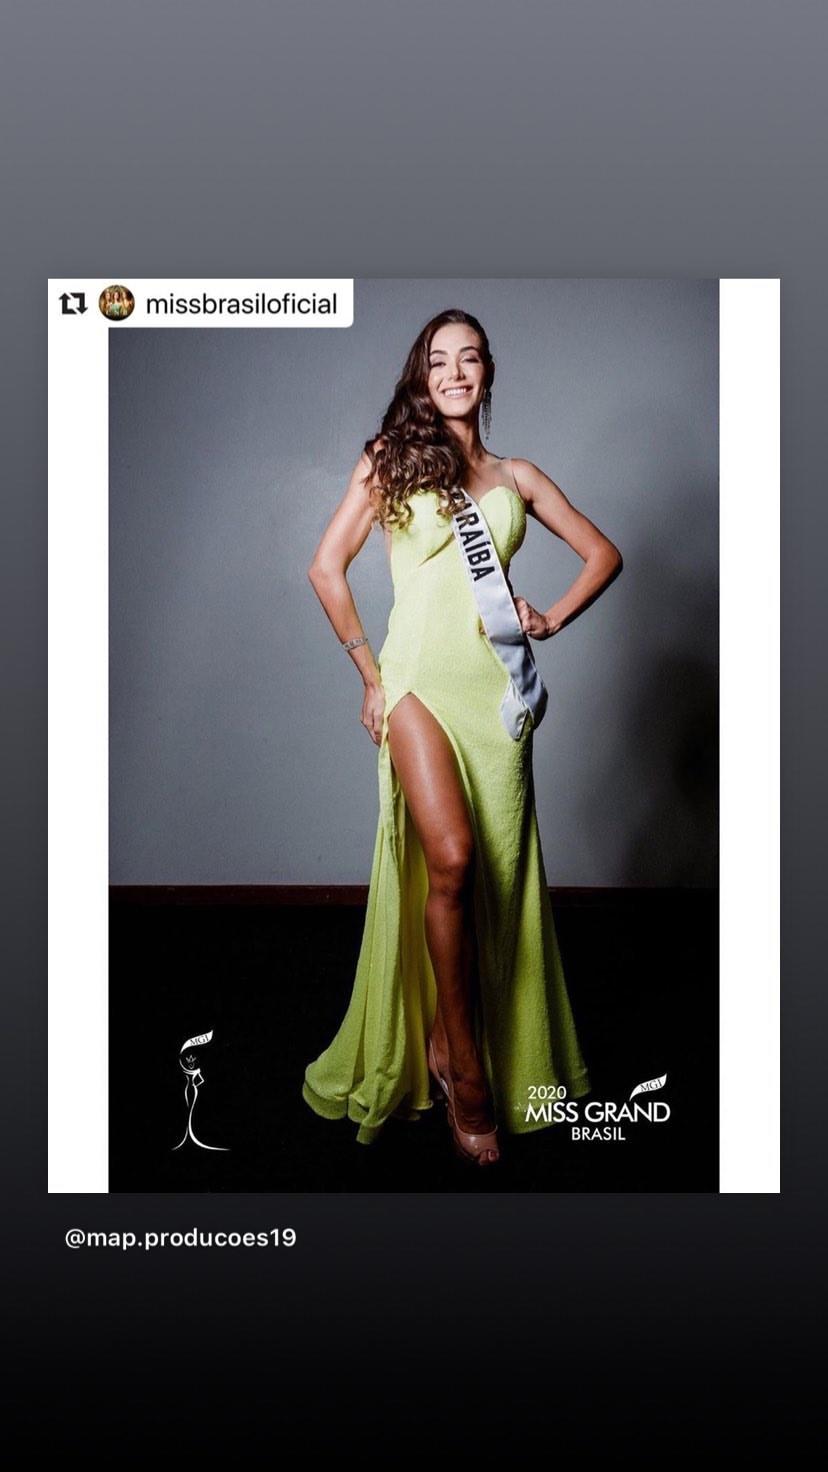 lala guedes, miss grand brasil 2020. - Página 7 83000710